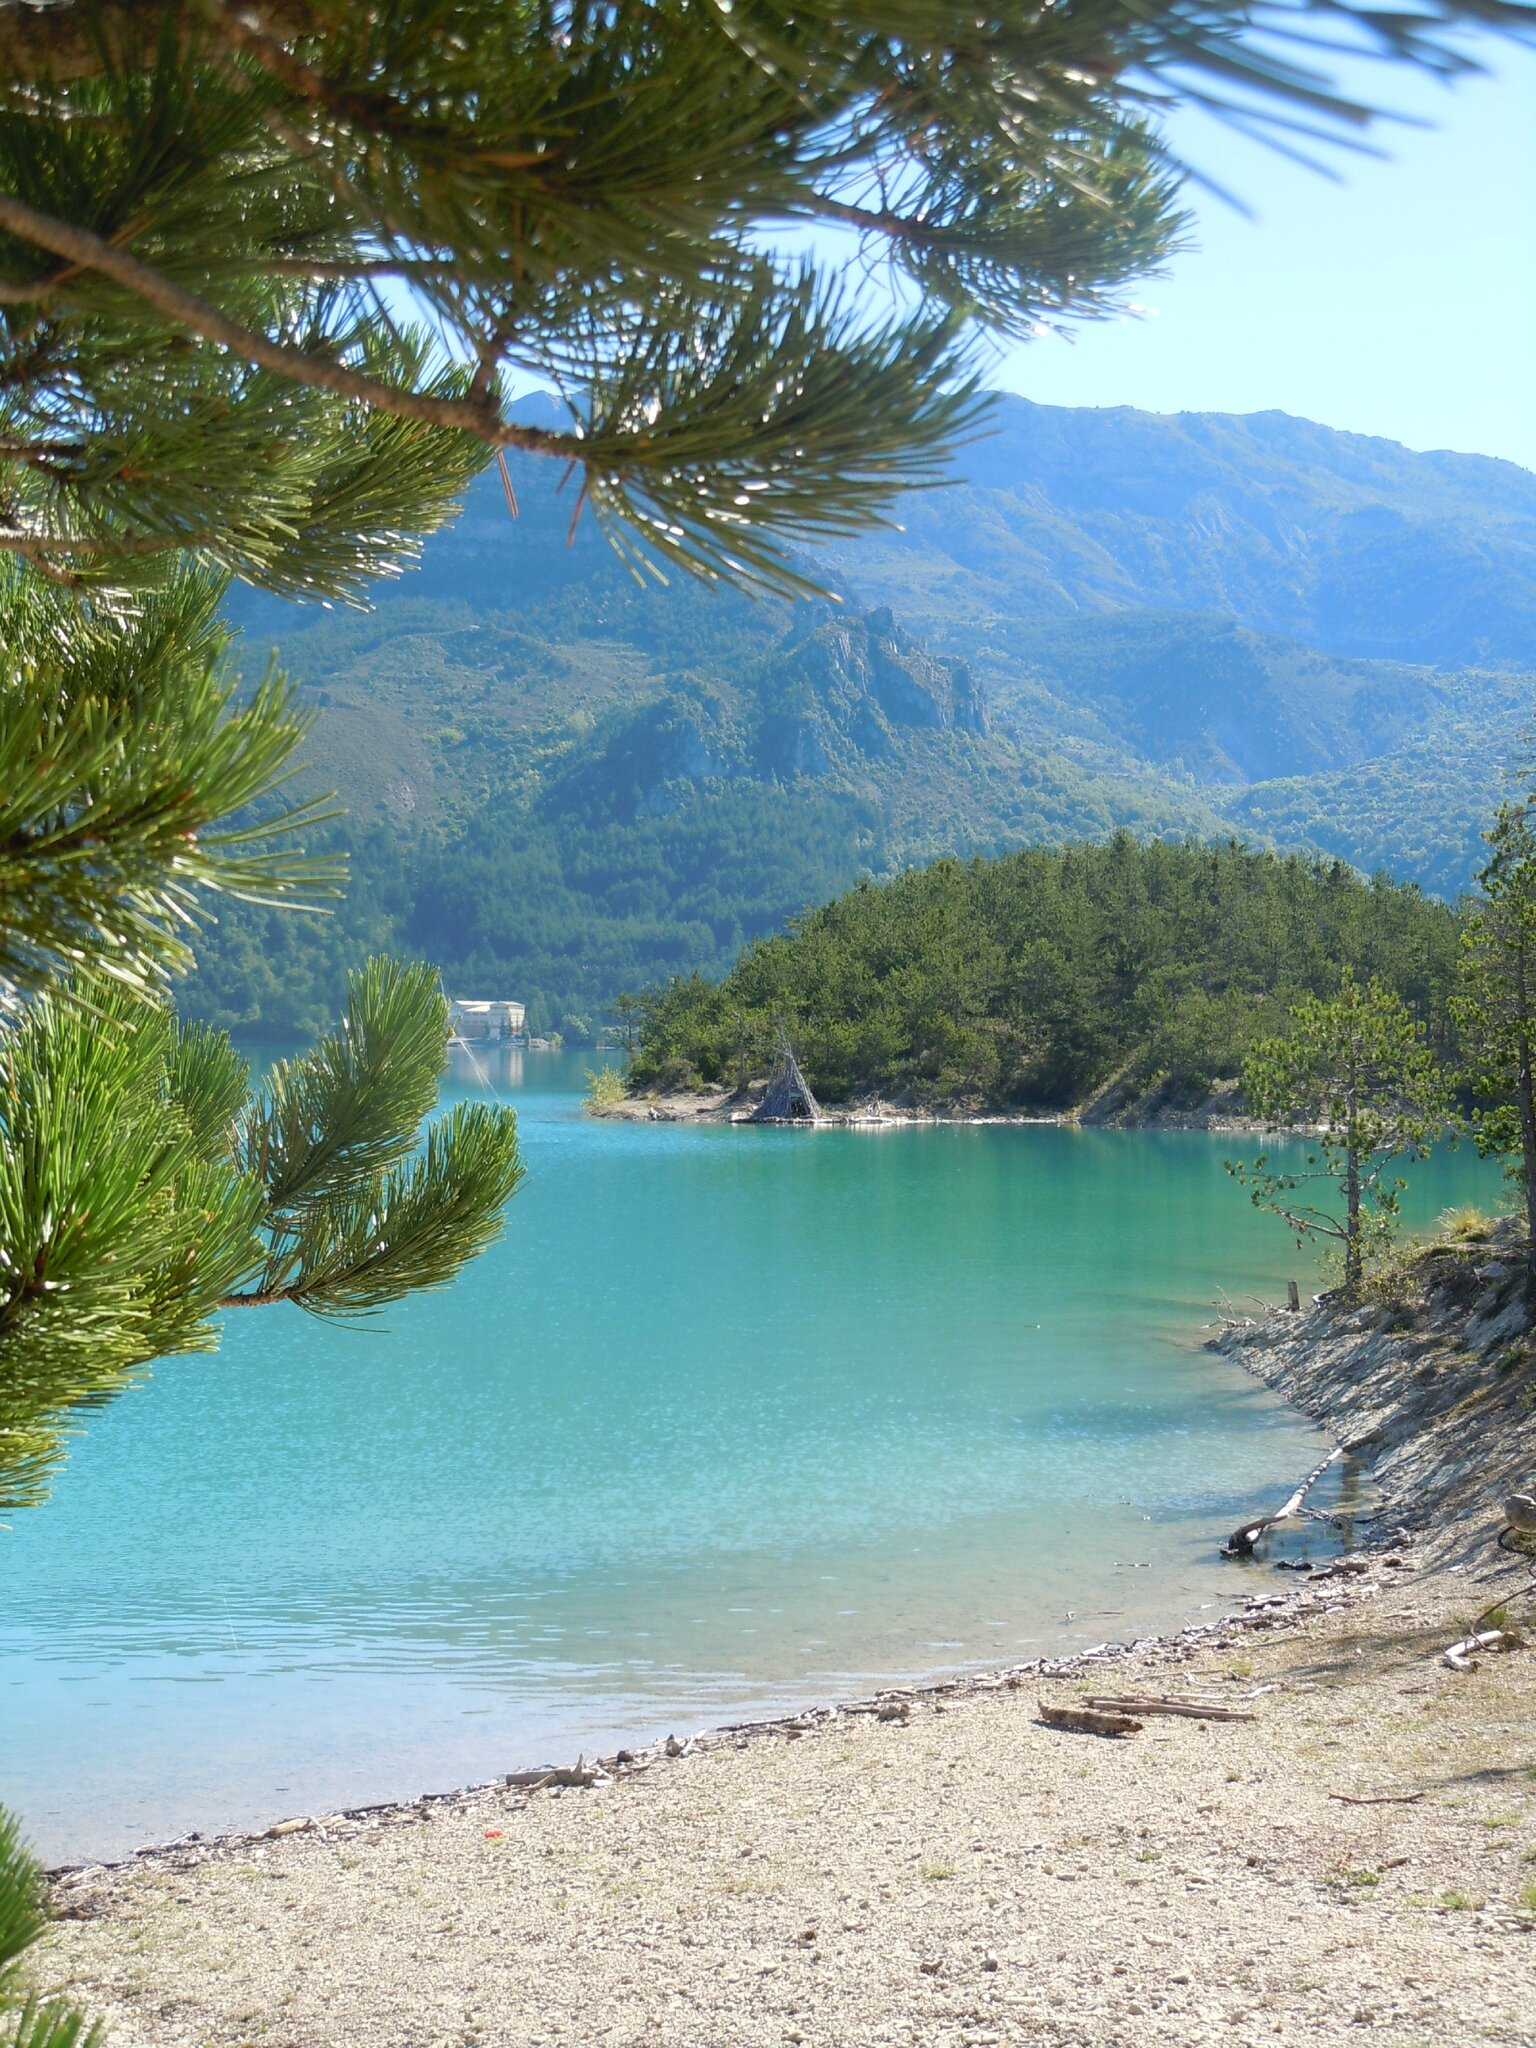 2014-07-31, lac de Castillon